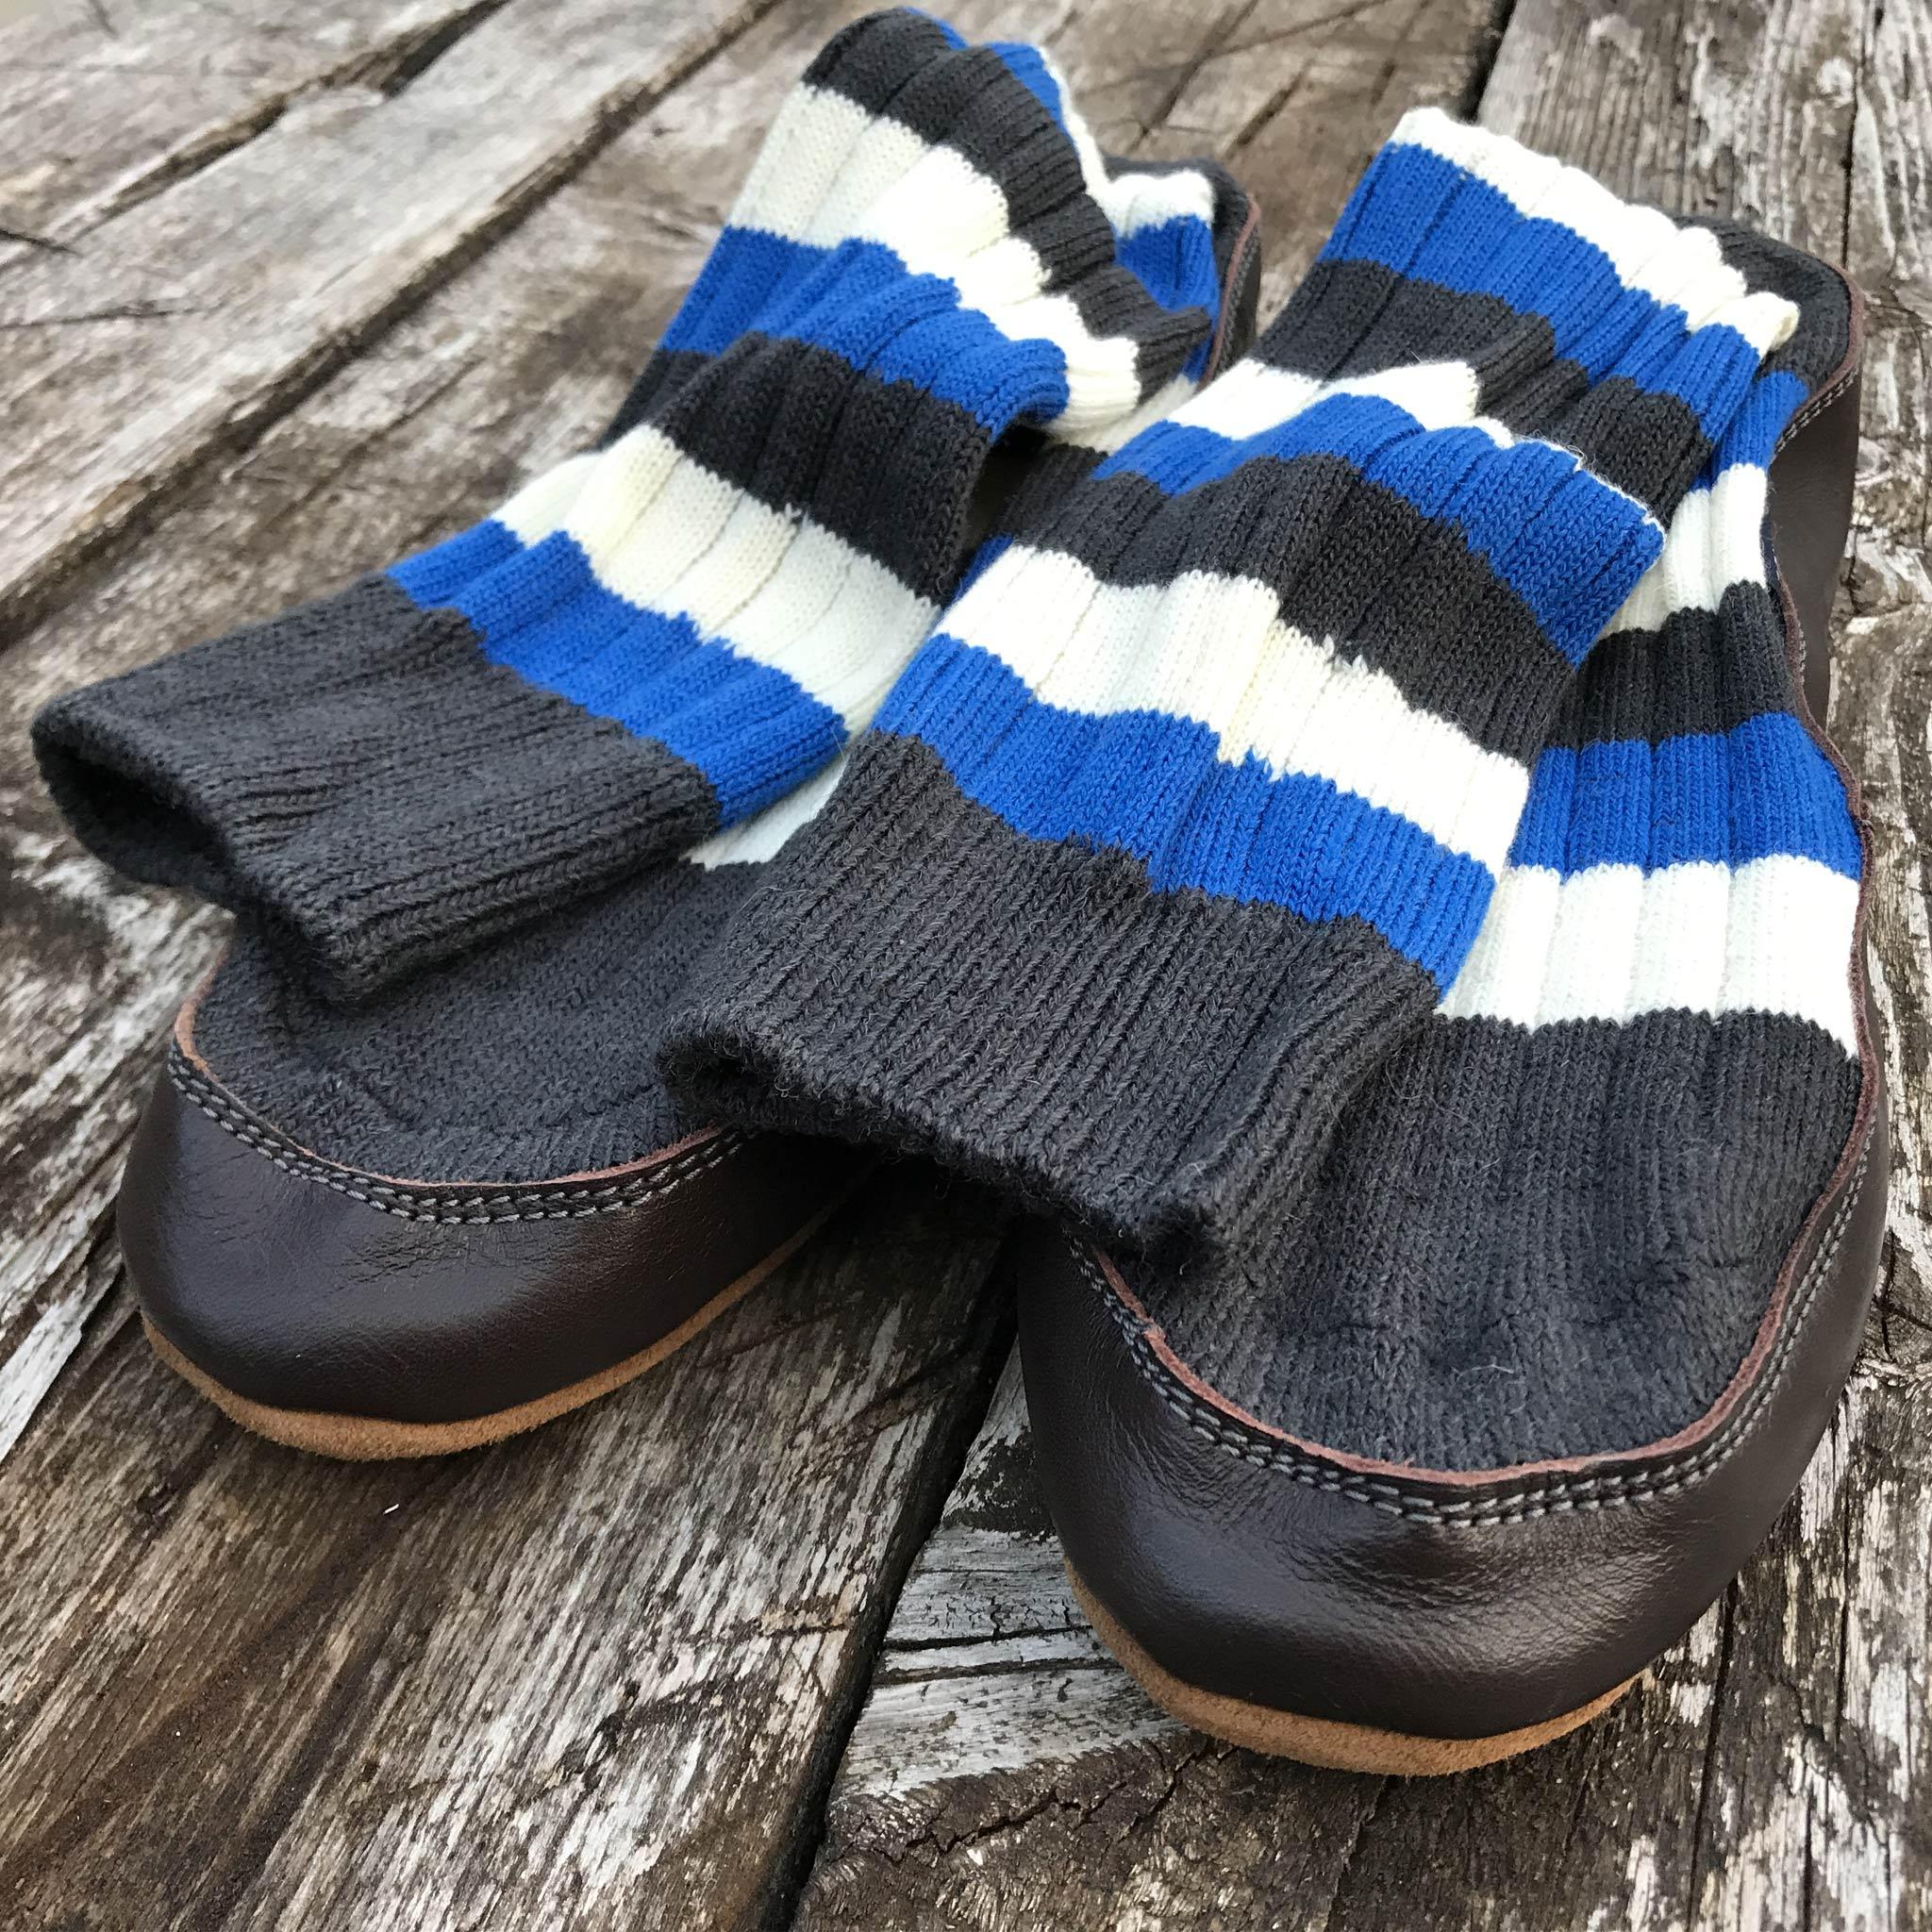 Slipper Sock black, blue and white stripe - front view